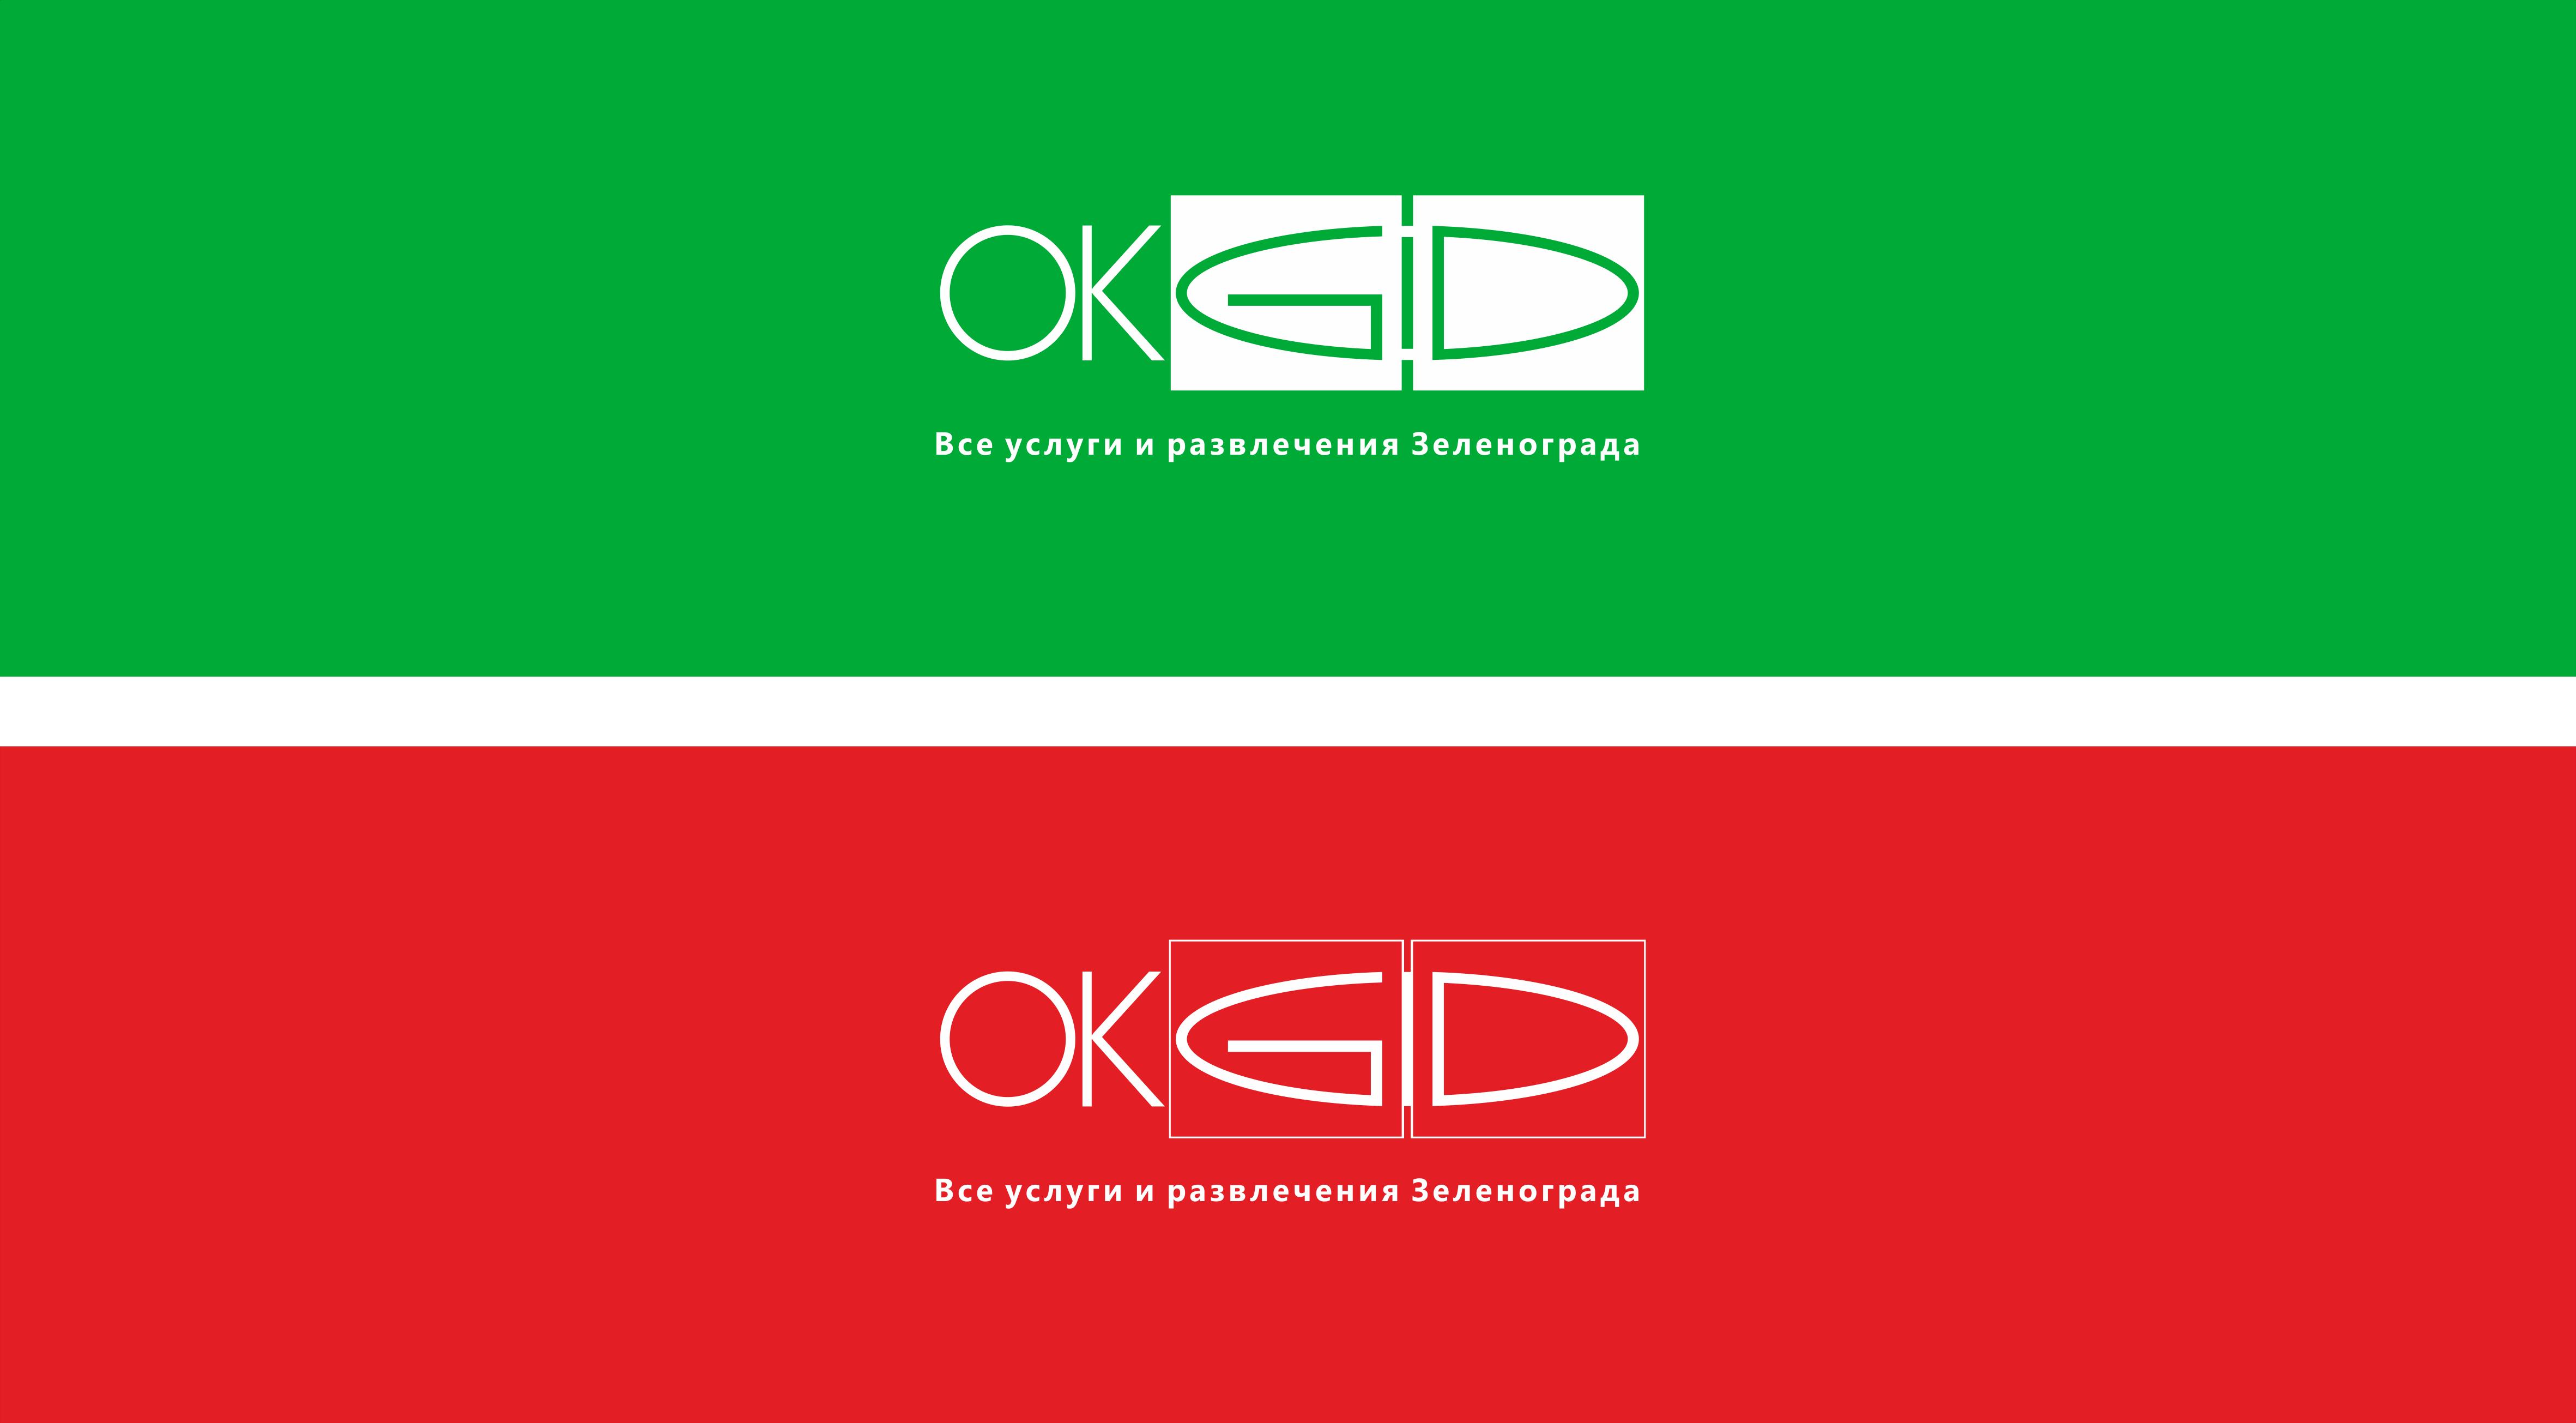 Логотип для сайта OKgid.ru фото f_02957c553cf041b5.png